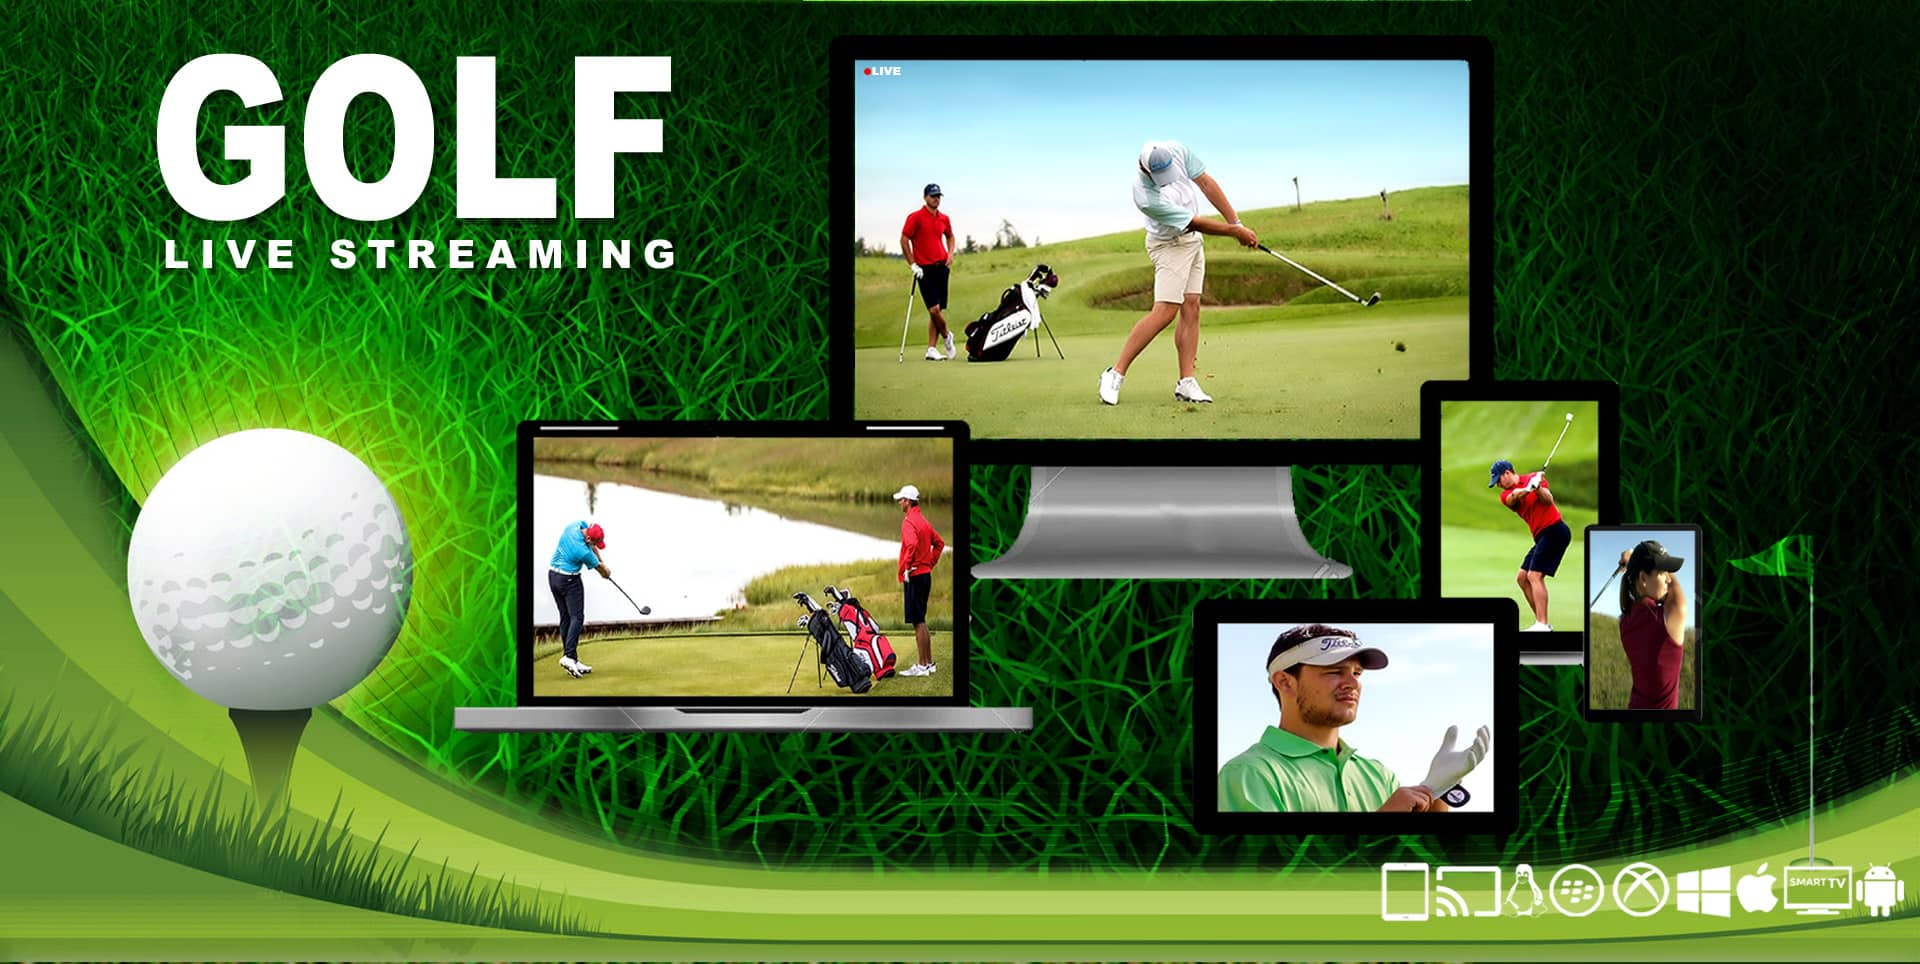 nashville-golf-open-live-streaming